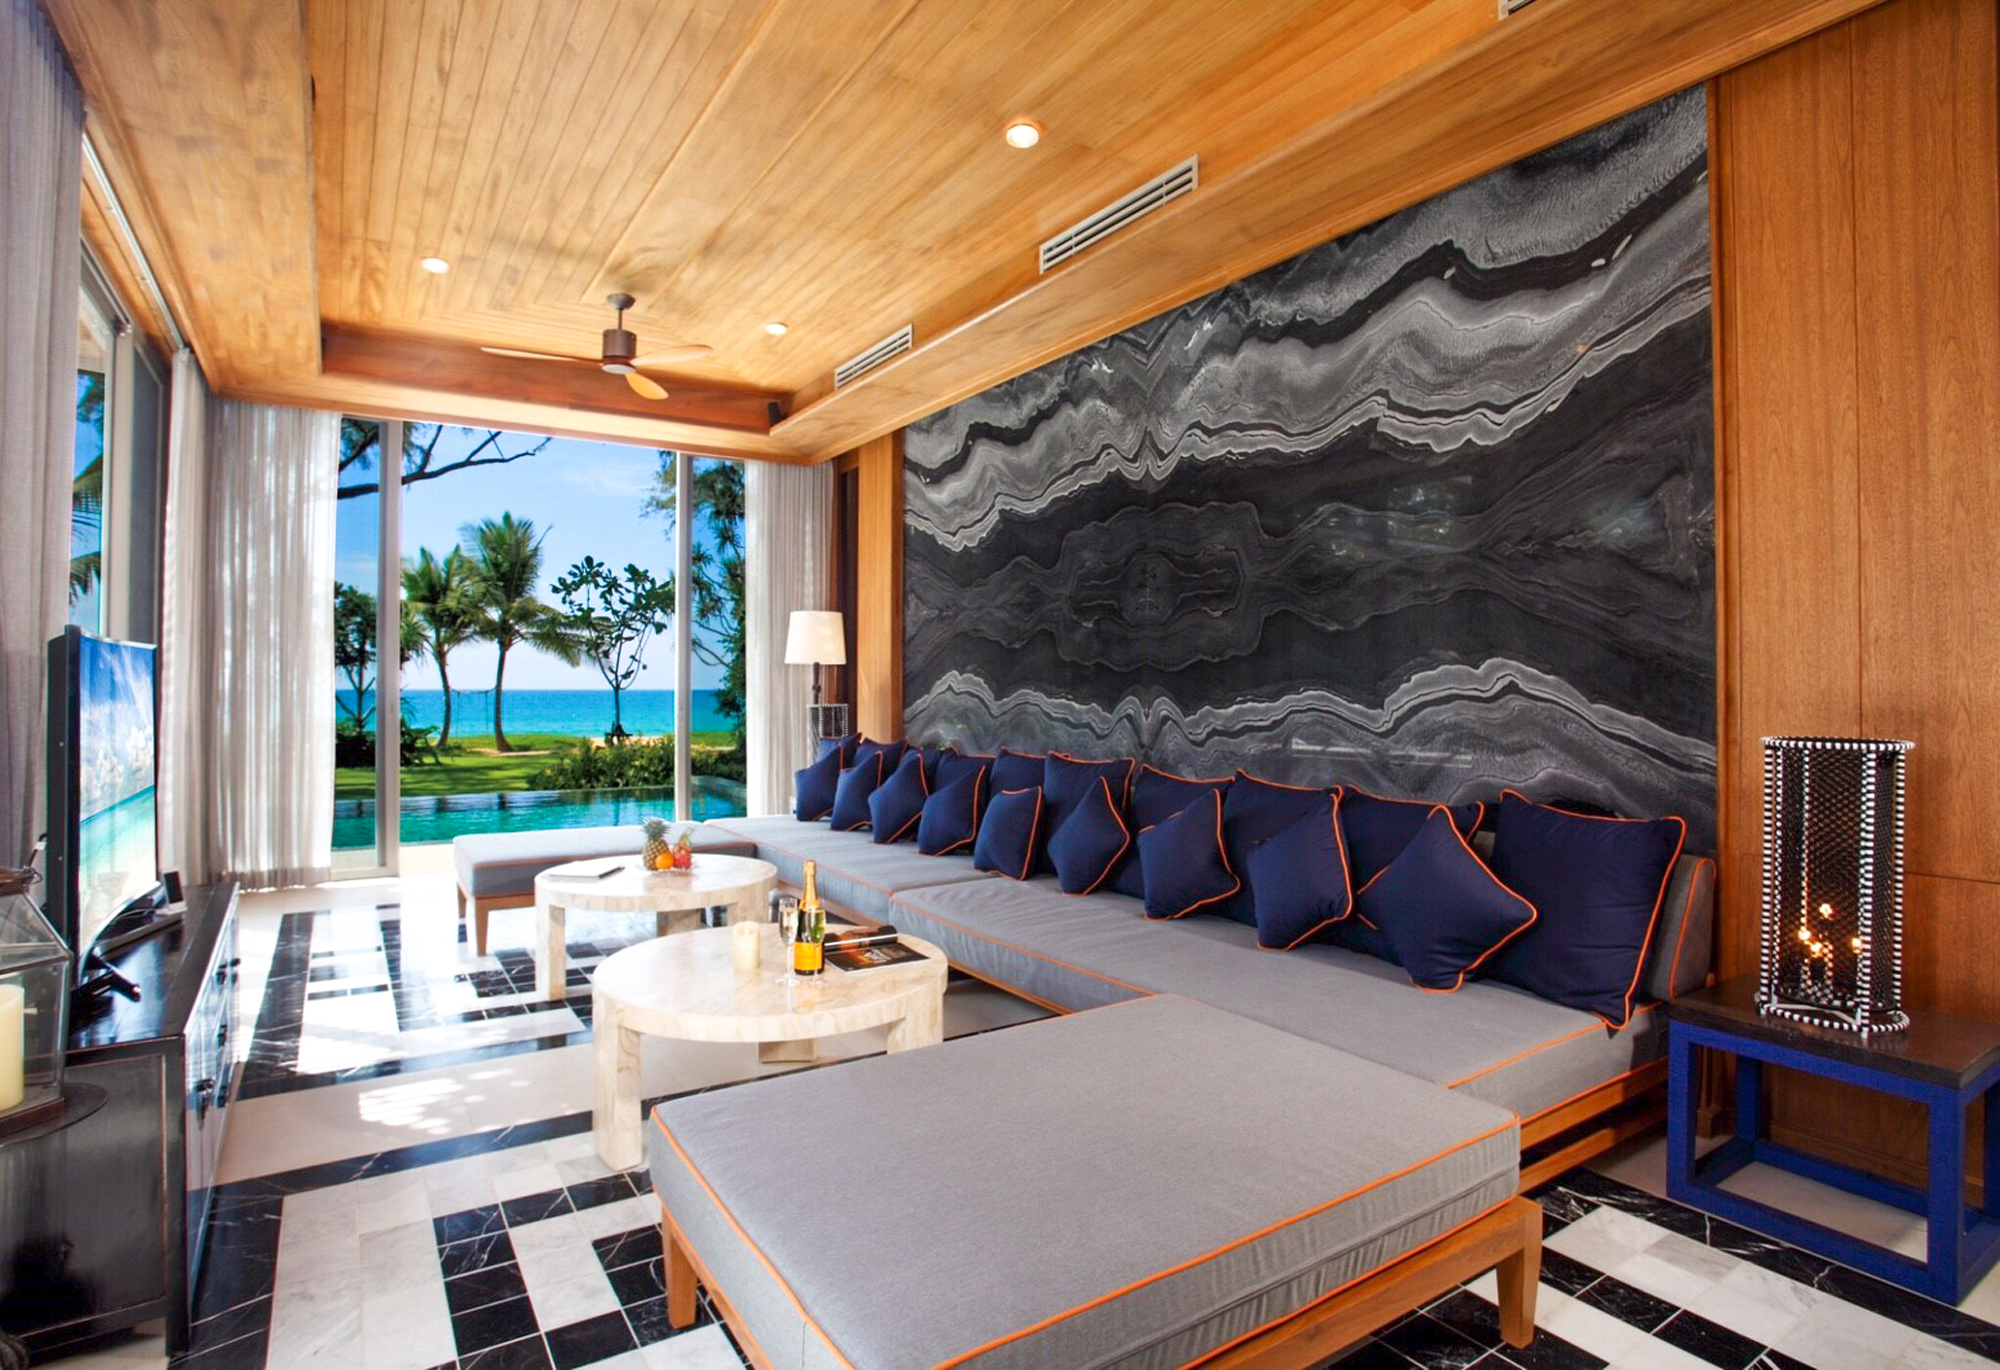 5-Bedroom Direct Beach Access Pool Villa